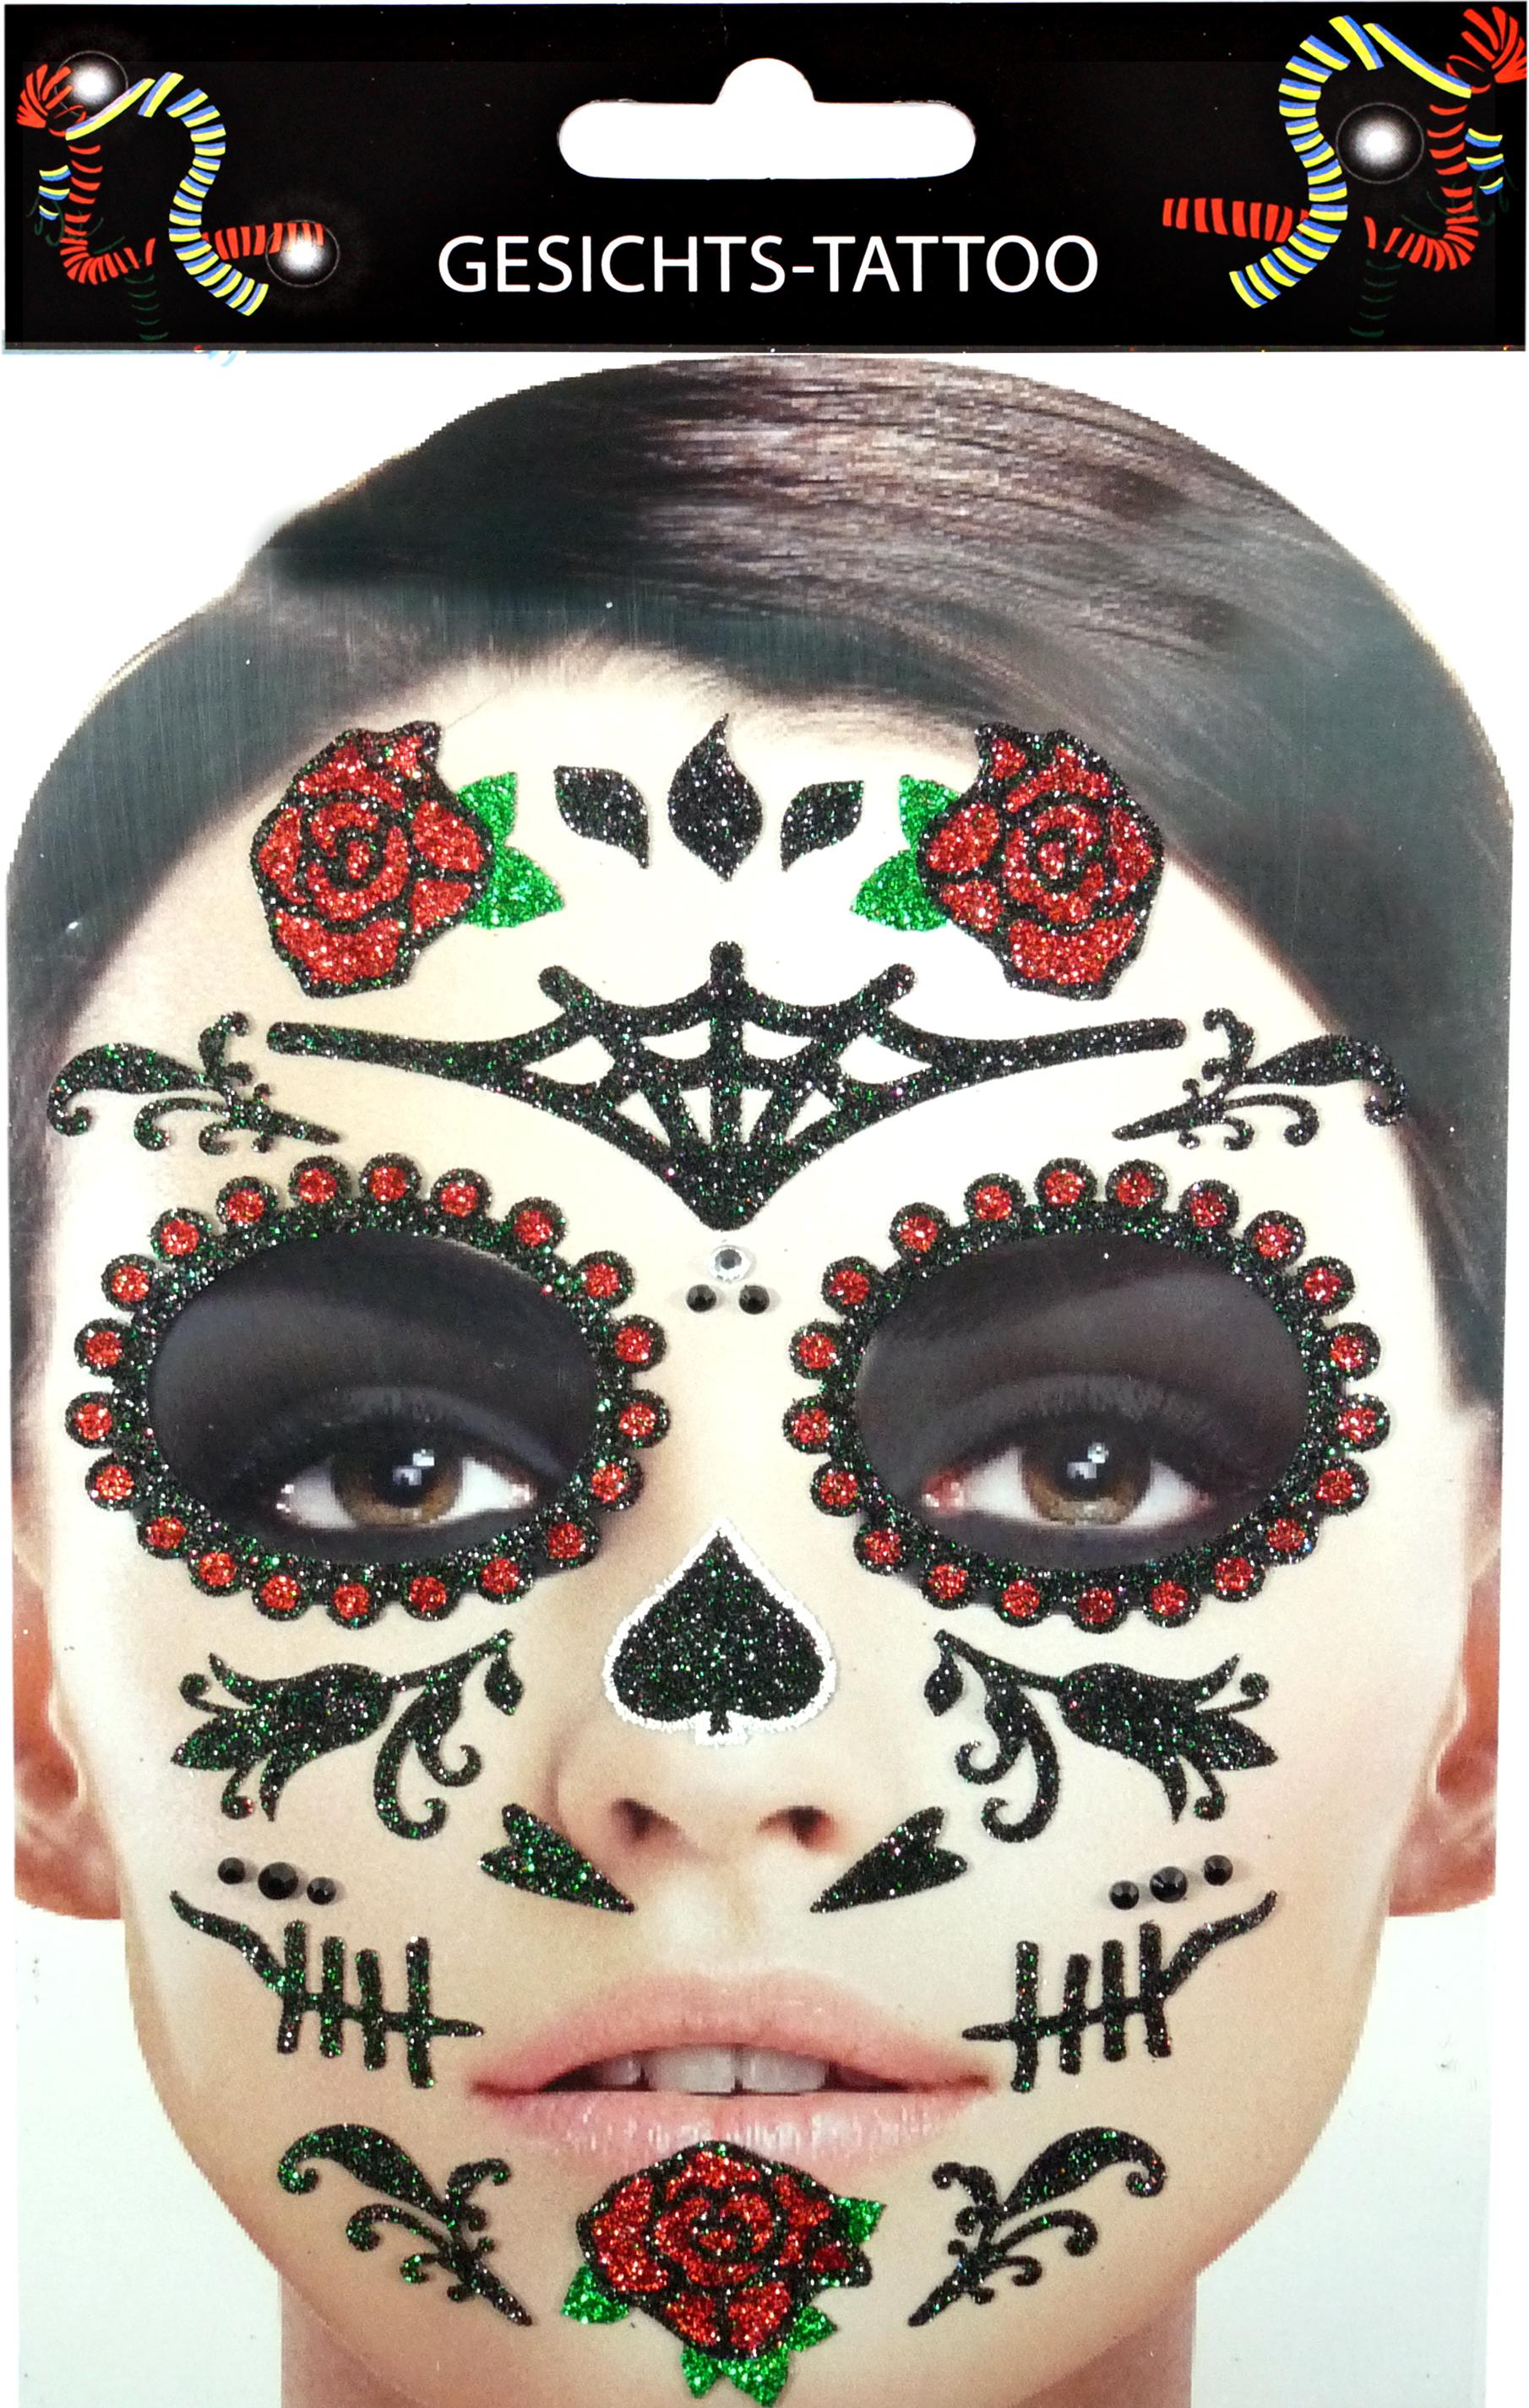 Gesichts-Tattoo Day of the Dead Rosen